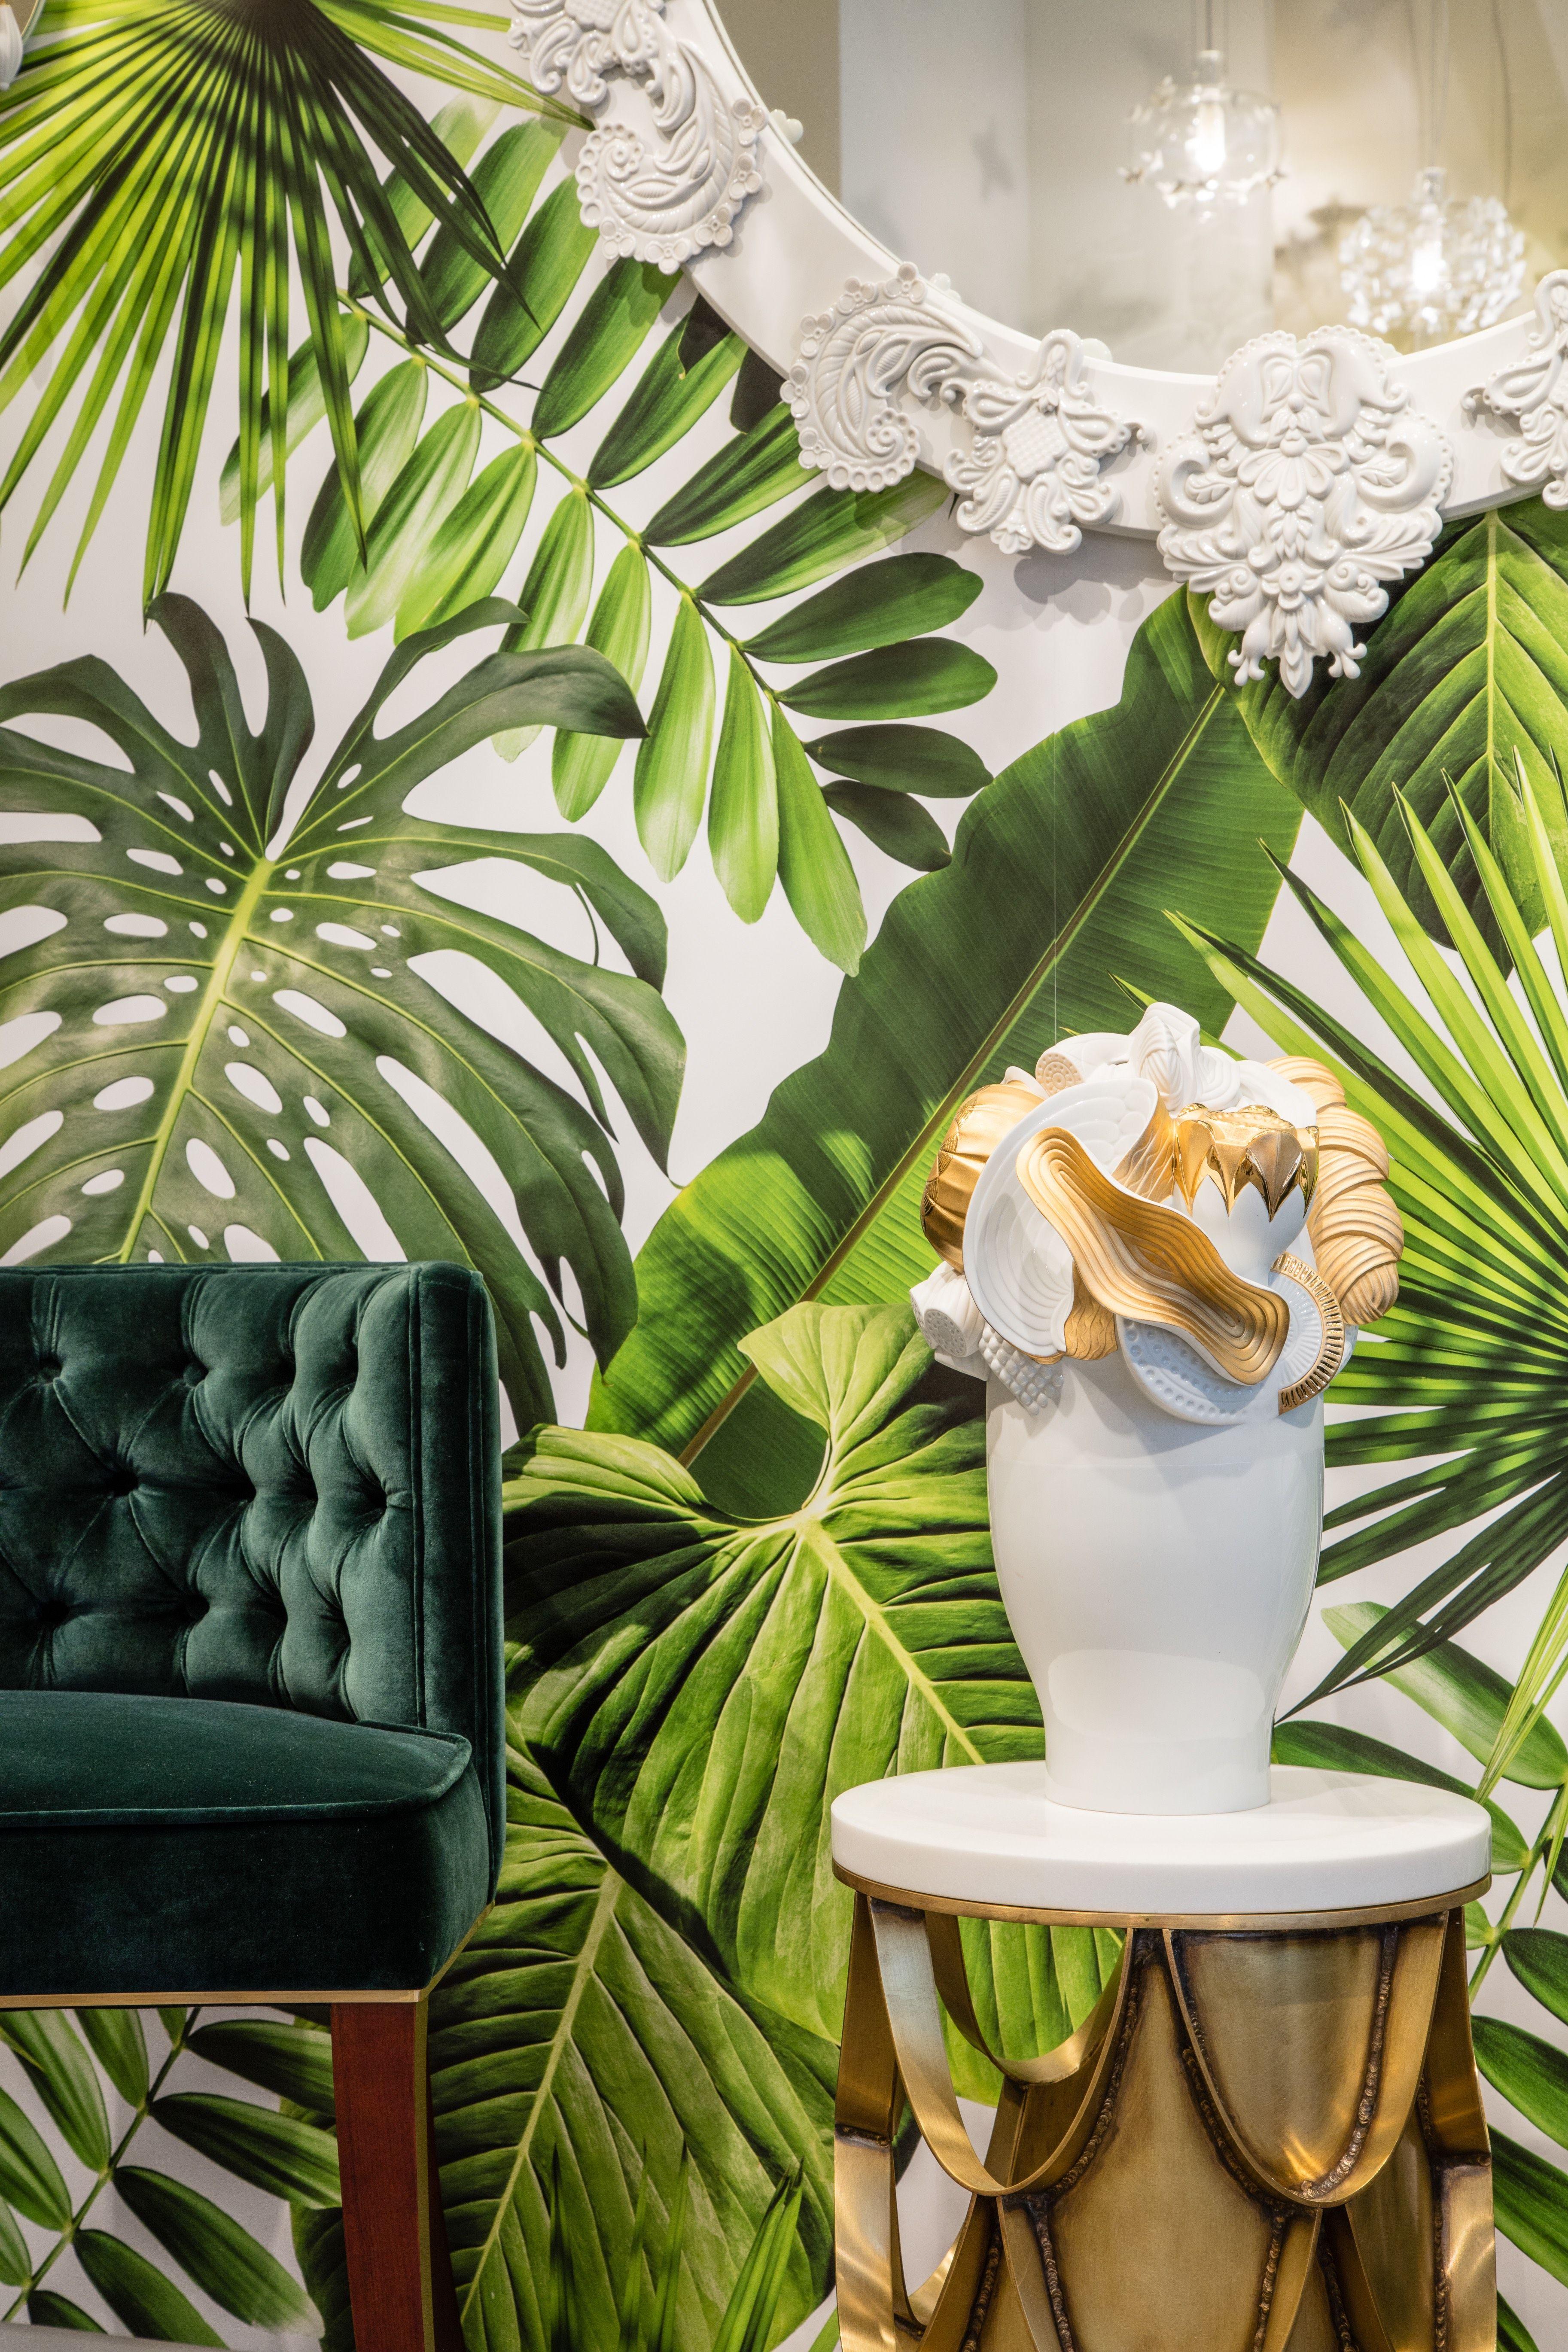 BRABBU TEAMS UP WITH LLADRÓ NYC FOR AN INCREDIBLE DESIGN EXPERIENCE @lladro   design experience, design furniture, modern interior design #designexperience #designfurniture #moderninteriordesign Find more inspirations: https://brabbu.com/blog/2017/07/brabbu-teams-lladro-nyc-incredible-design-experience/